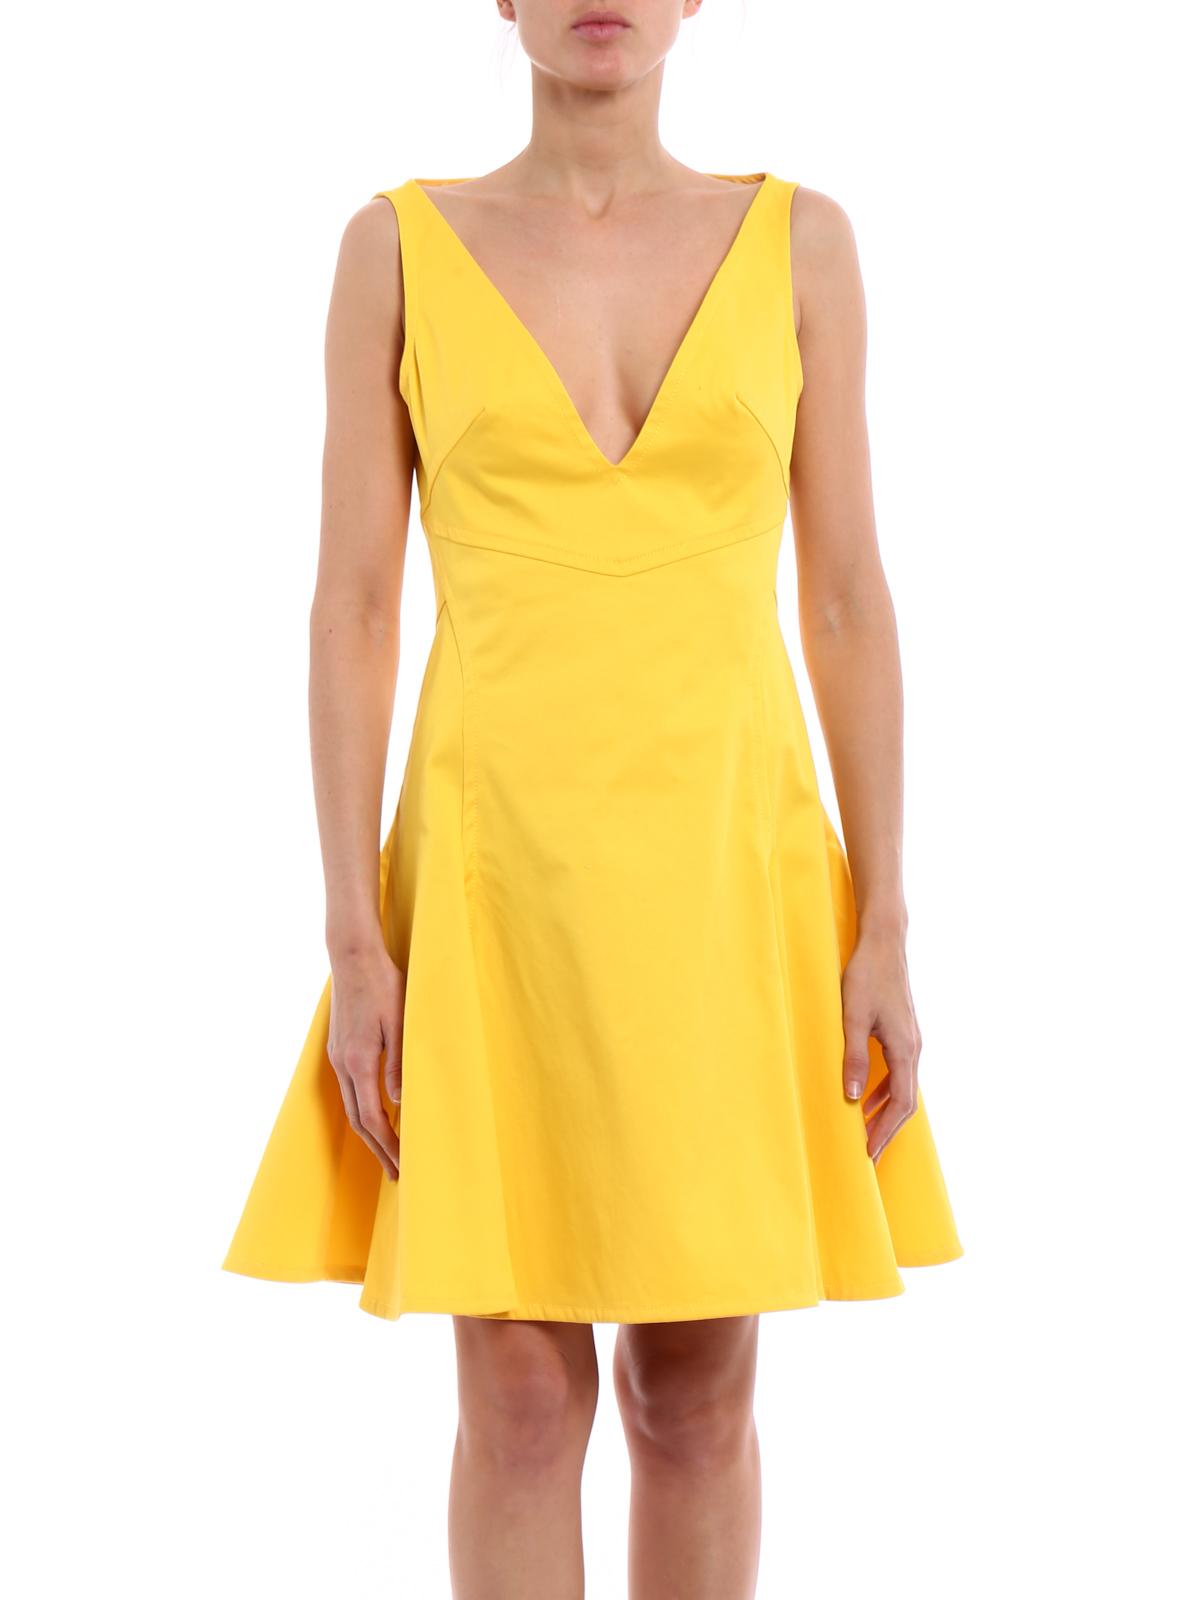 premium selection 7873a c09d1 Dsquared2 - Knielanges Kleid - Gelb - Knielange Kleider ...